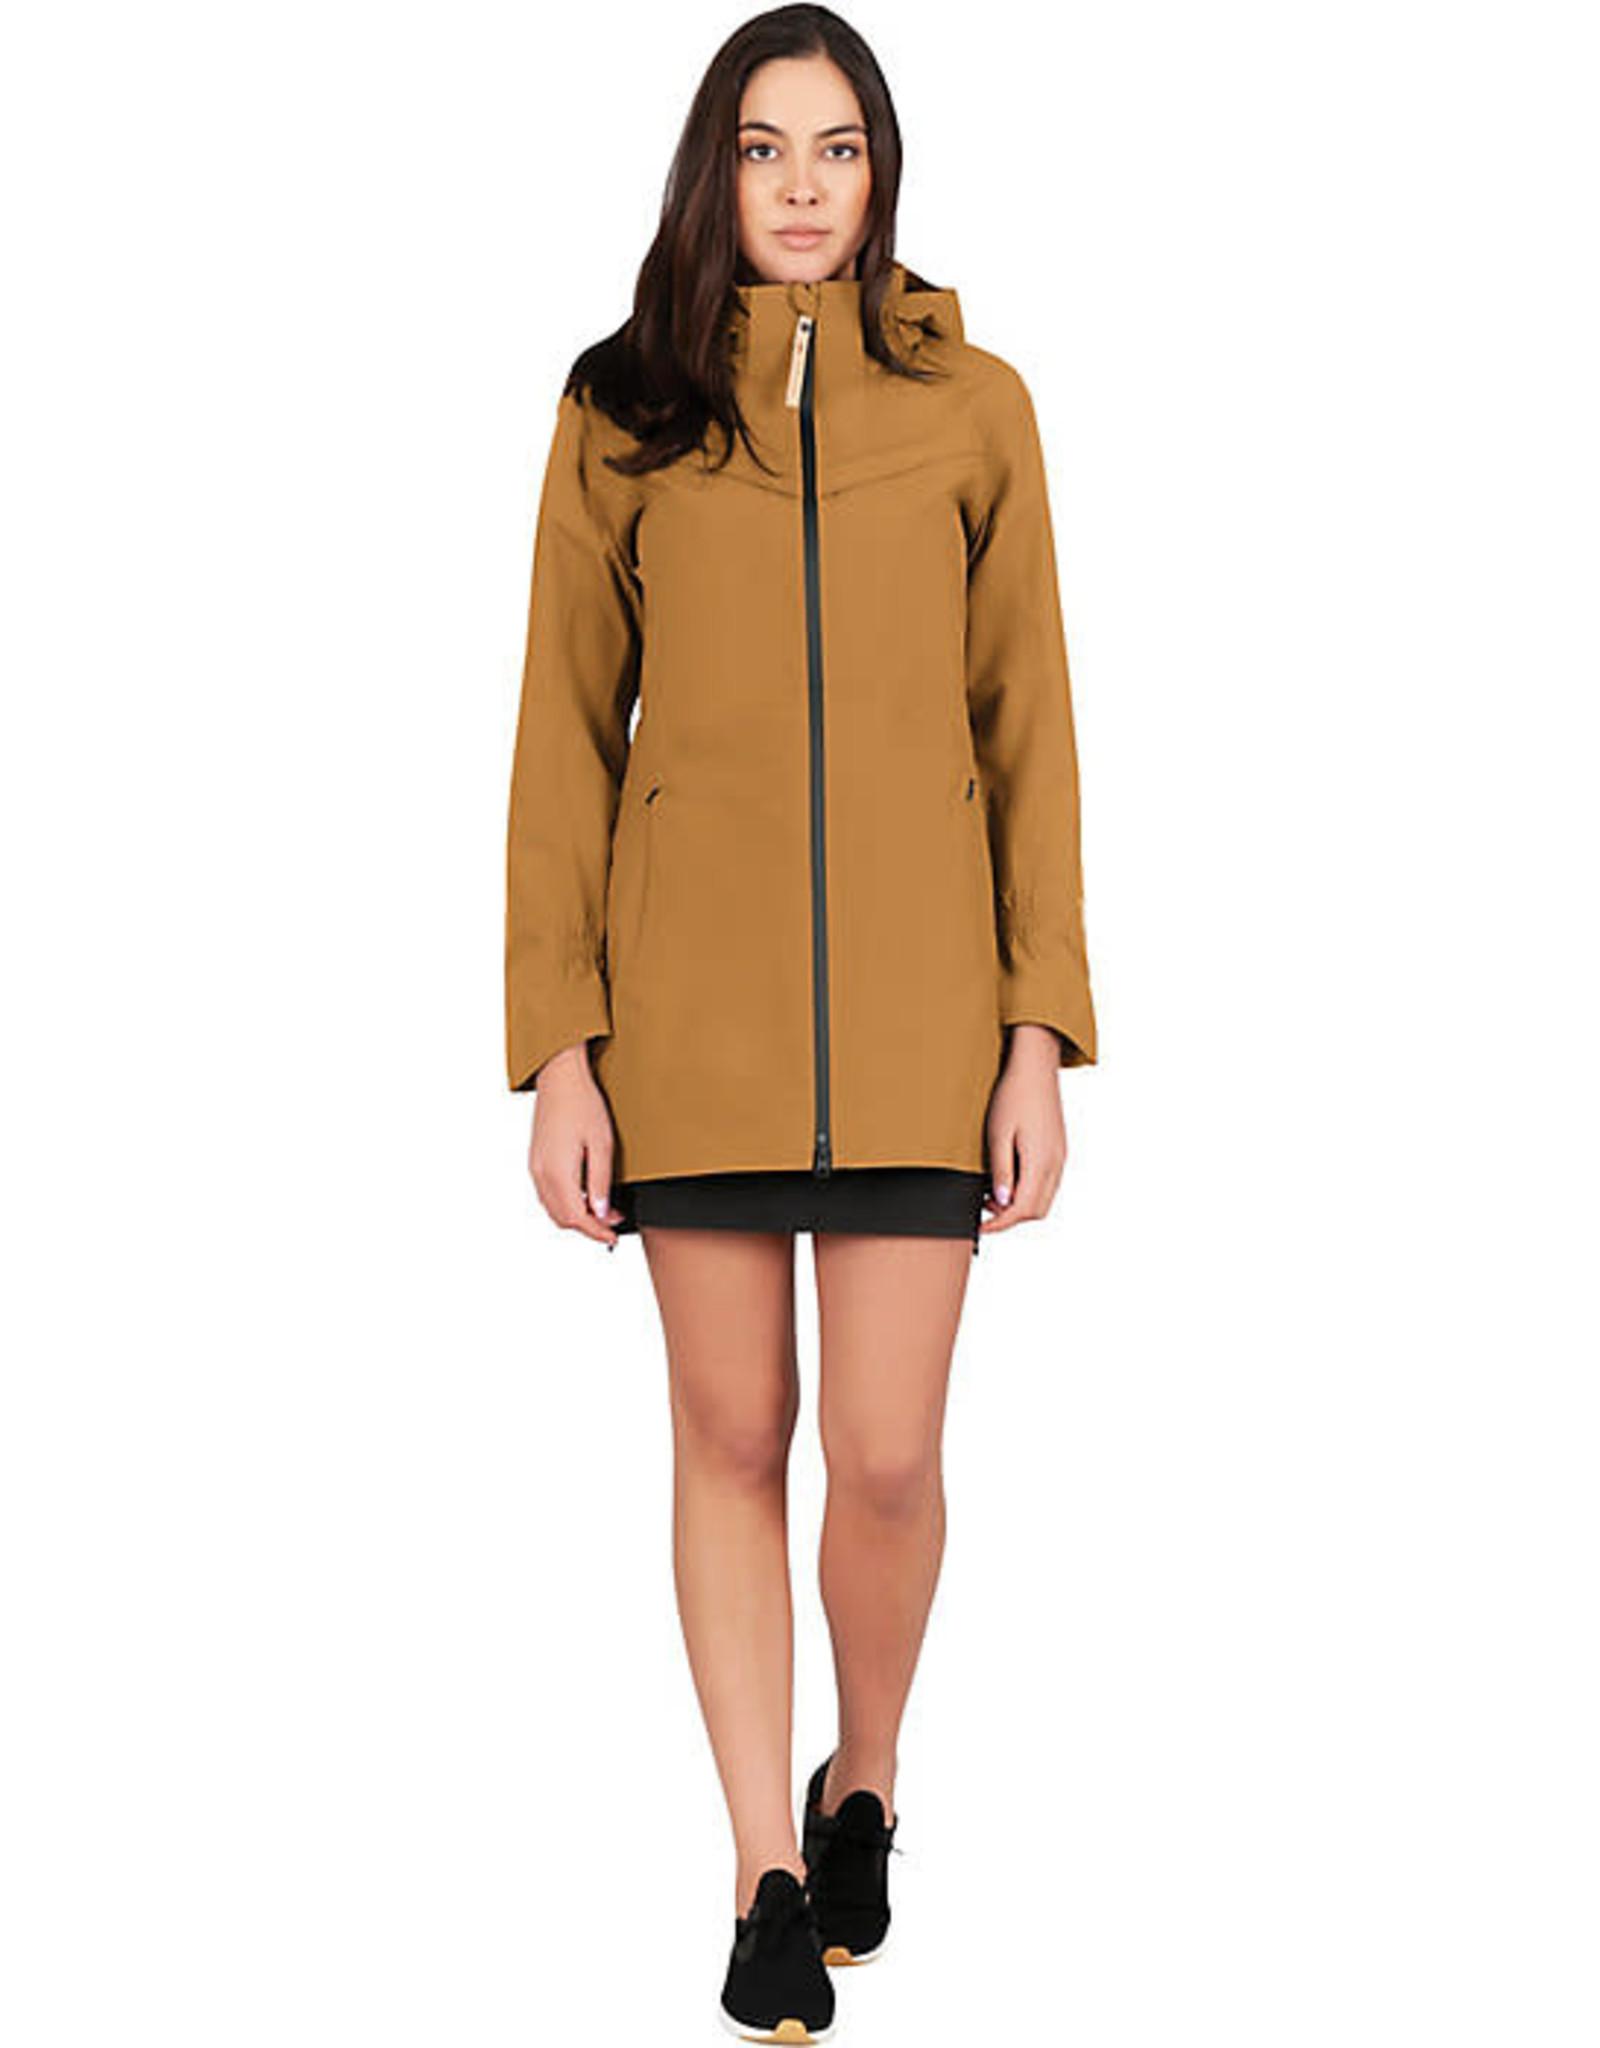 Indygena is now Indyeva Kisa jacket